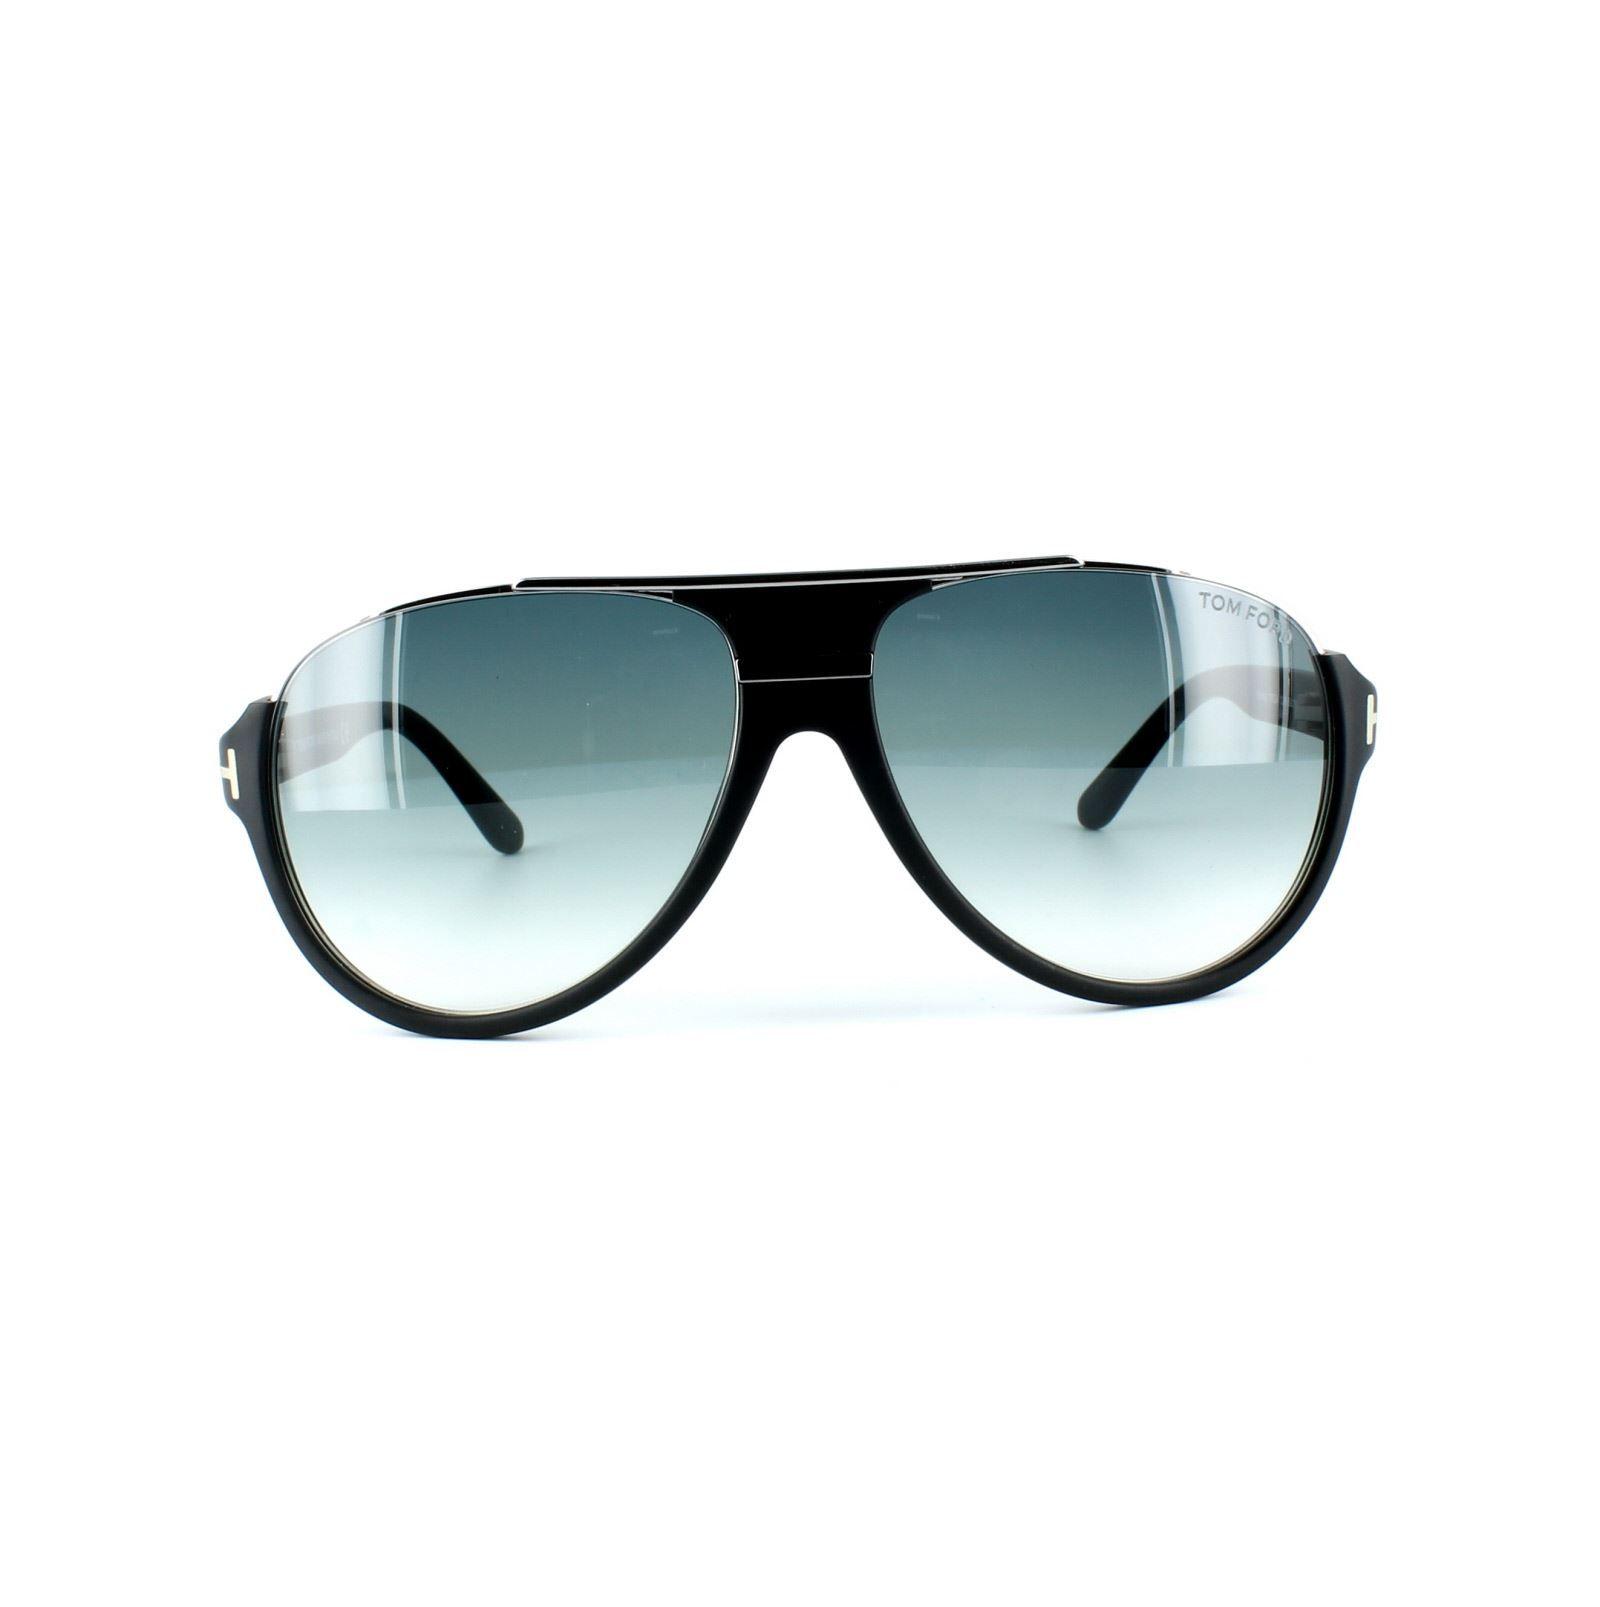 Tom Ford Sunglasses 0334 Dimitry 02W Matt Black Blue Grey Gradient